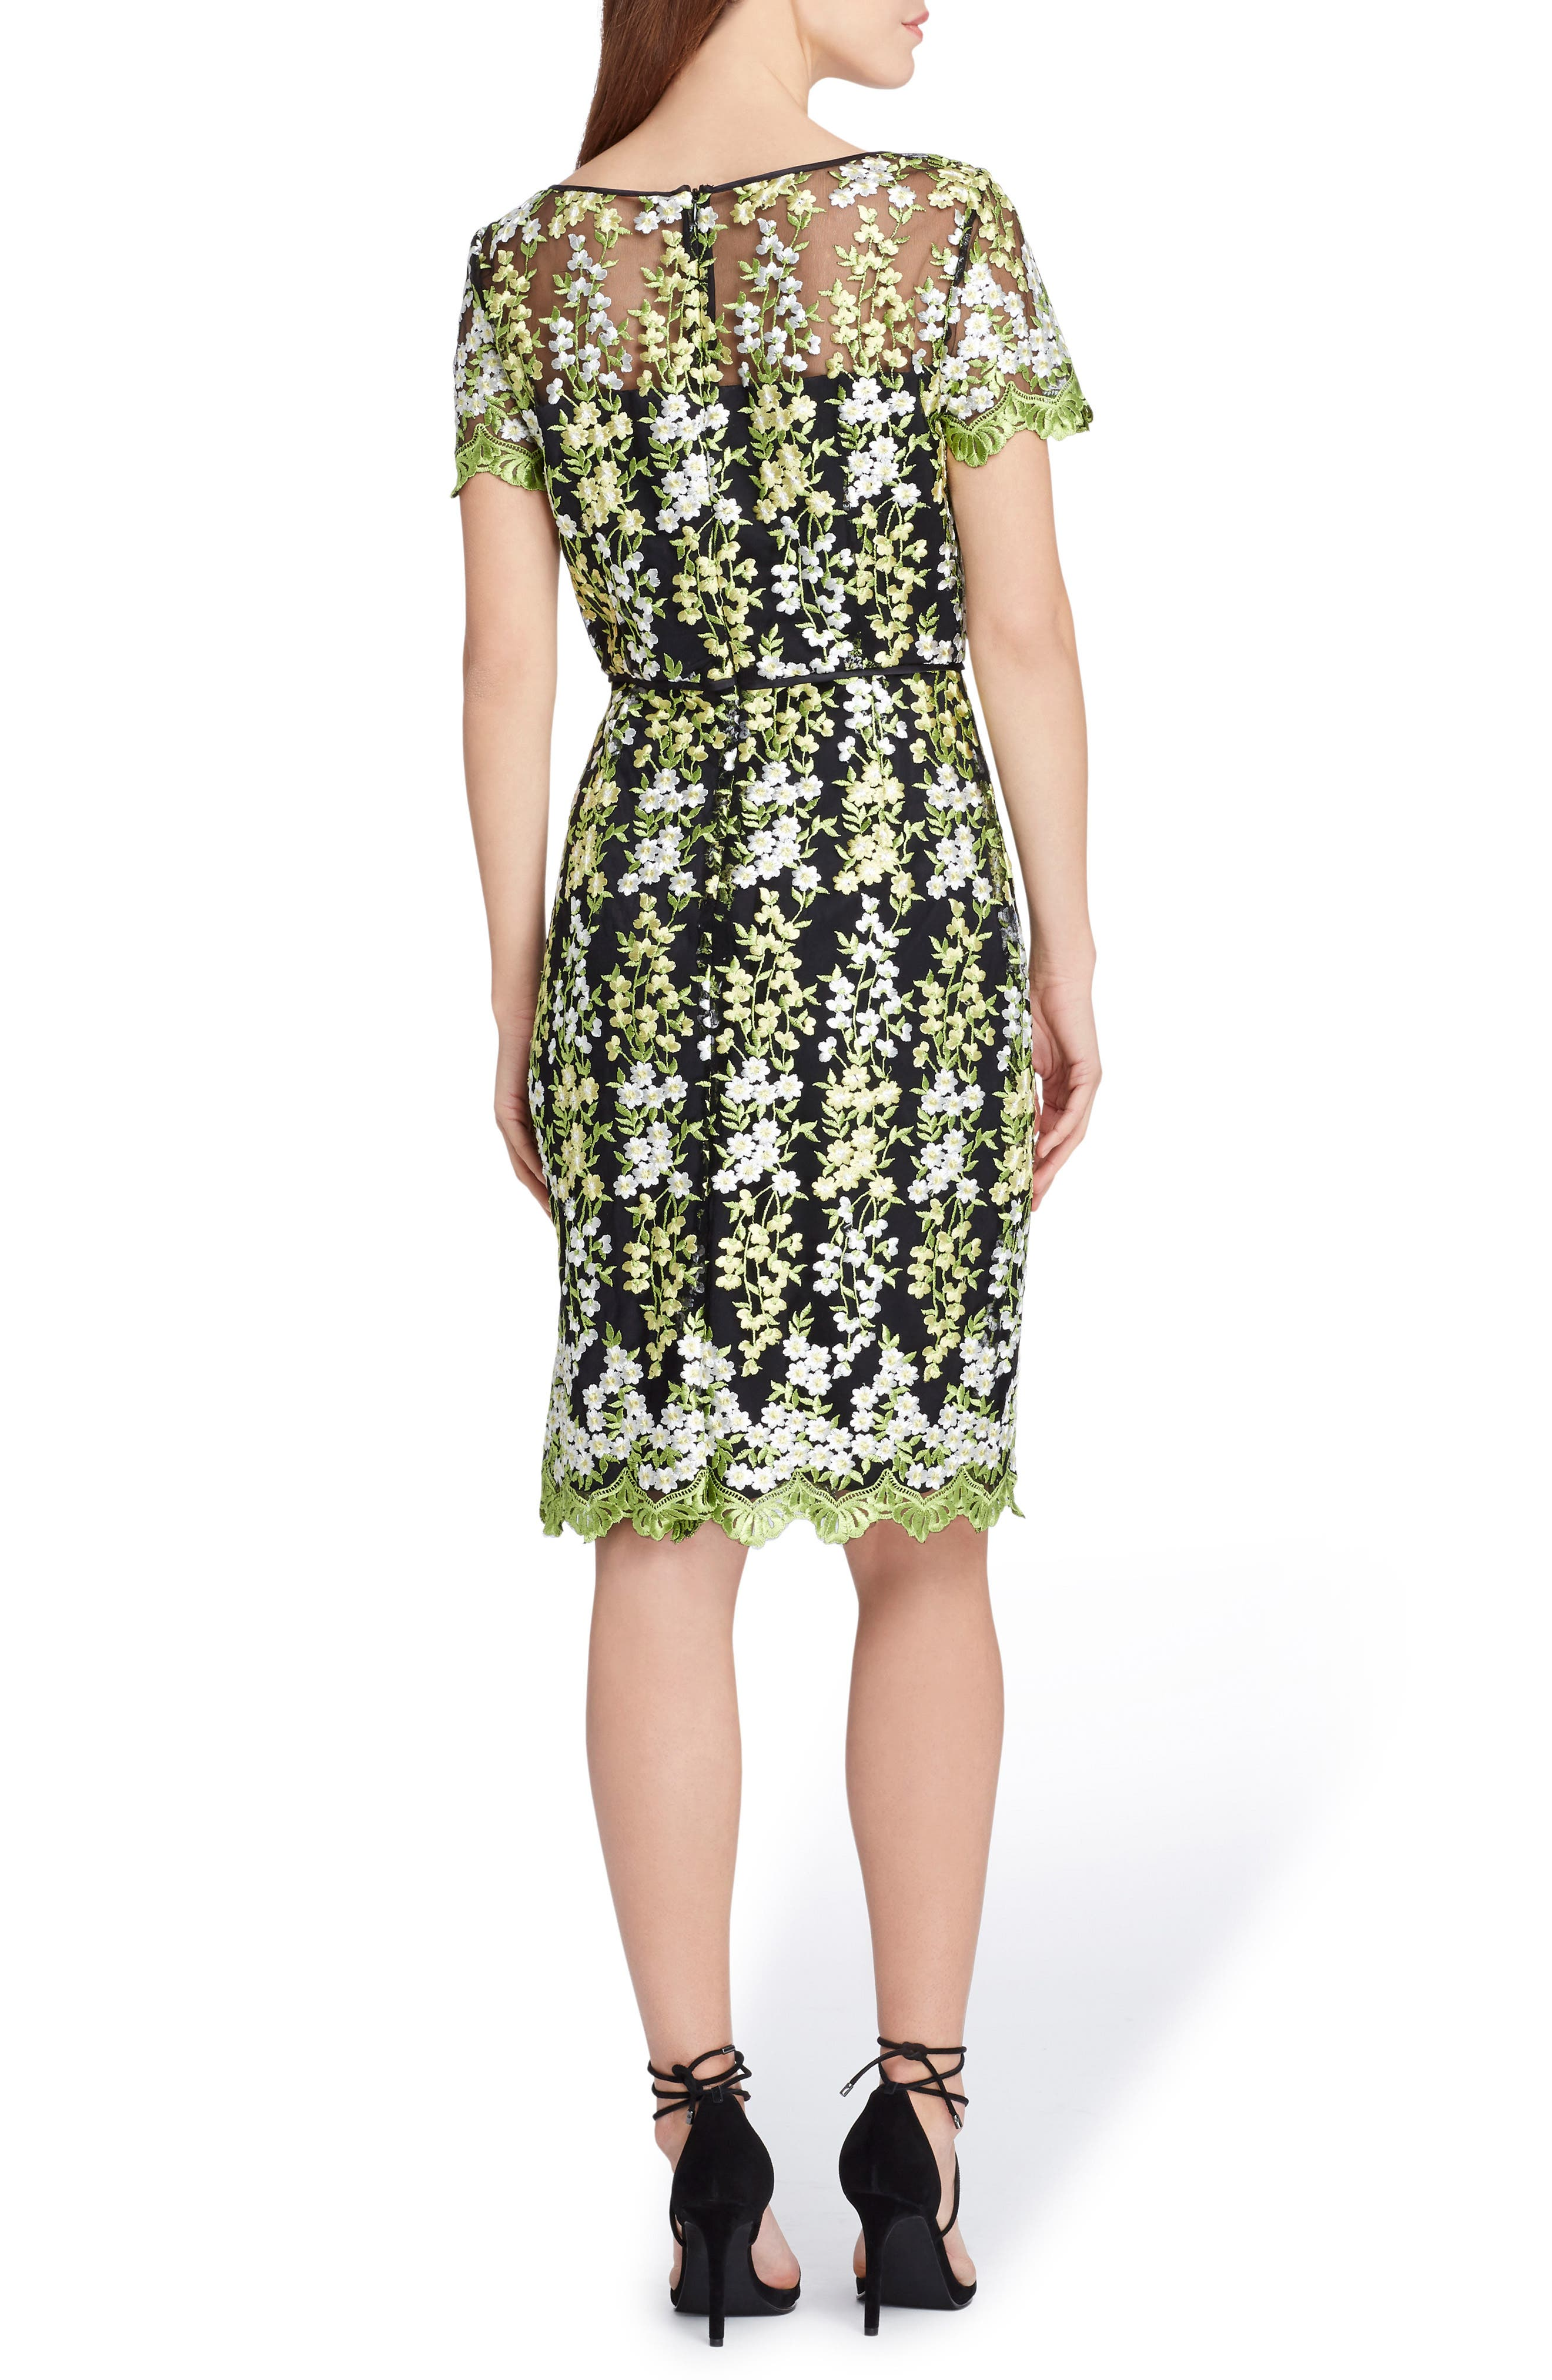 Floral Embroidery Sheath Dress,                             Alternate thumbnail 2, color,                             Black/ Lemon/ Green